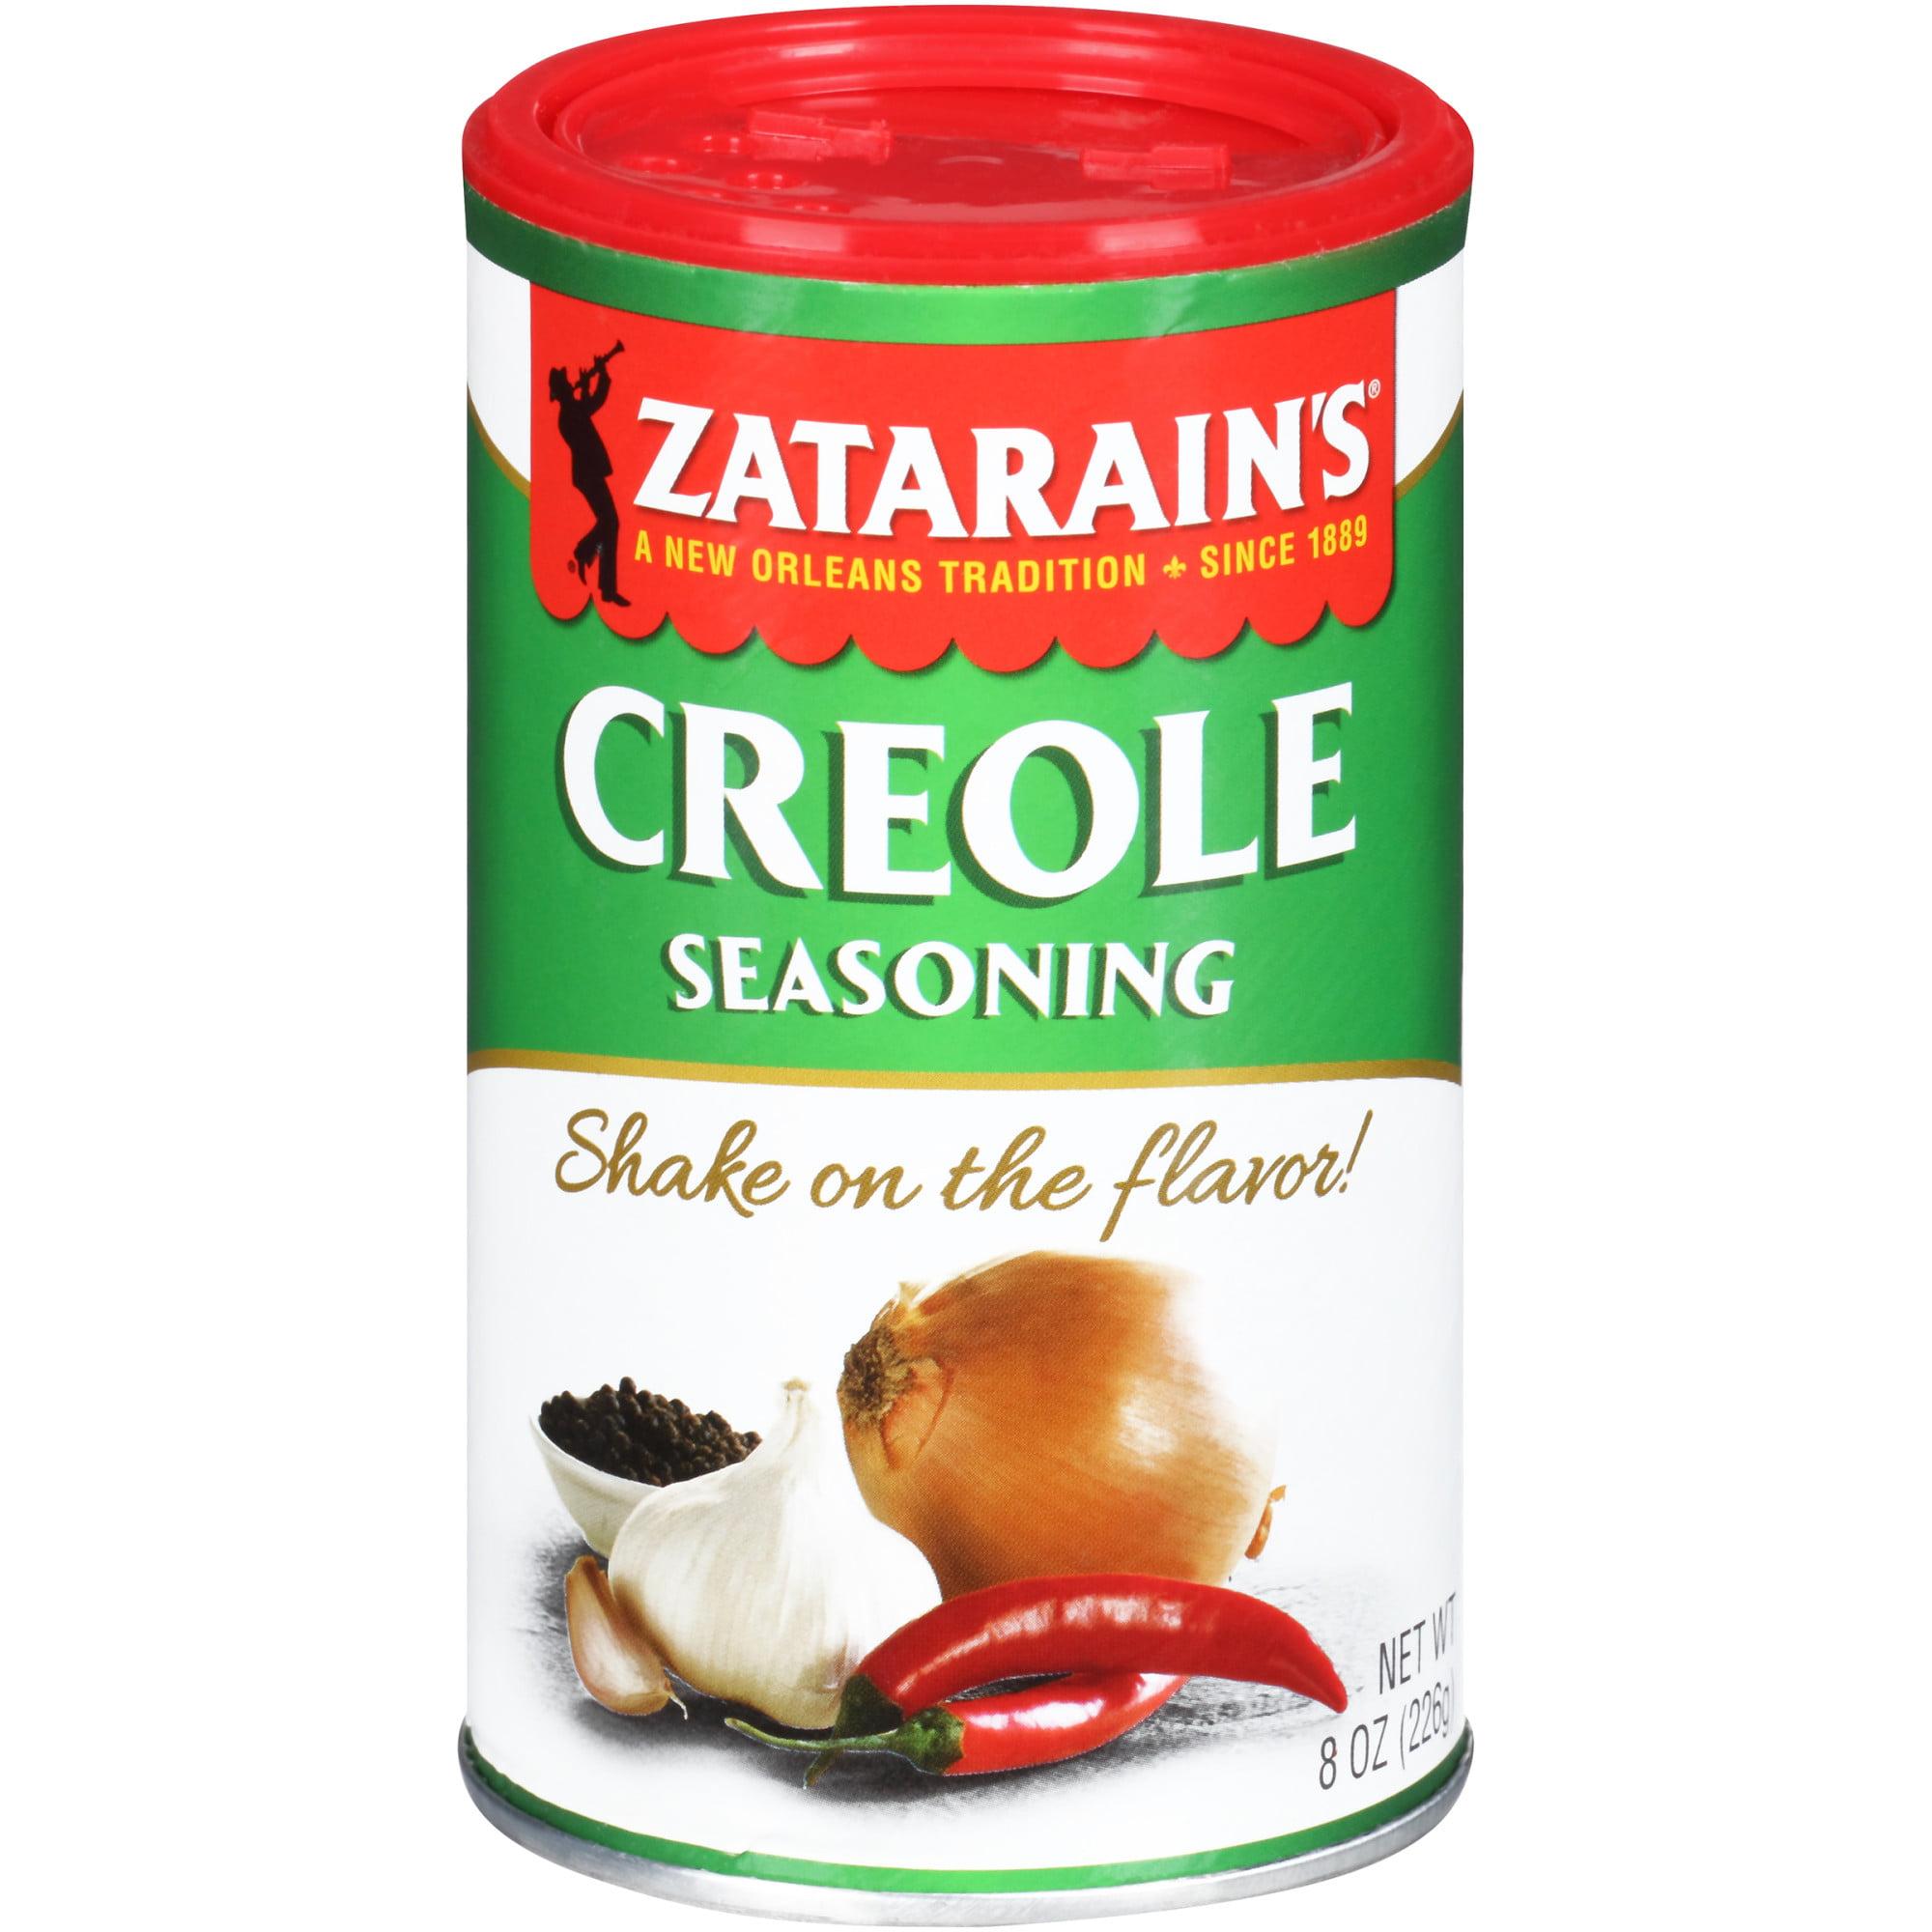 (24 Pack) Zatarain's New Orleans Style Creole Seasoning, 8 oz